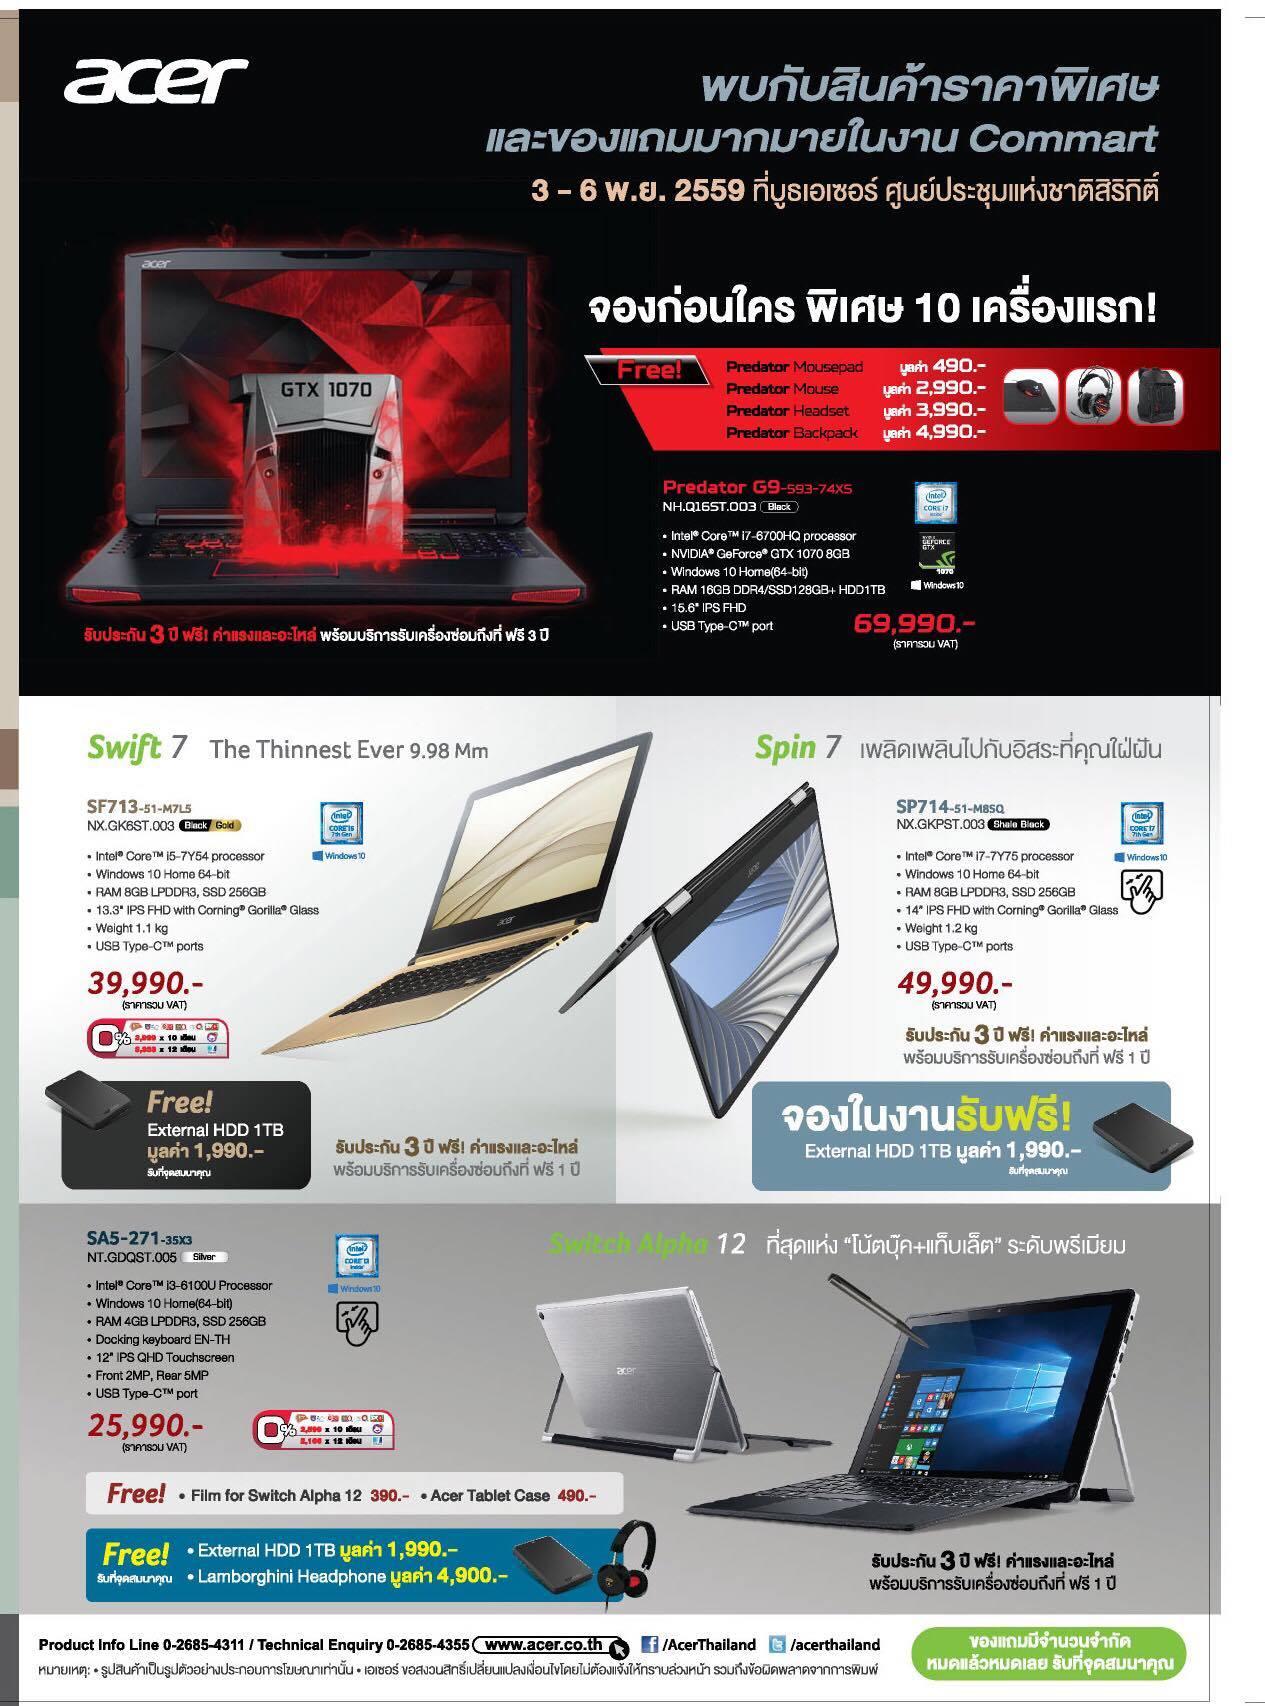 Acer-Commart-Work-2016-SpecPhone-00003